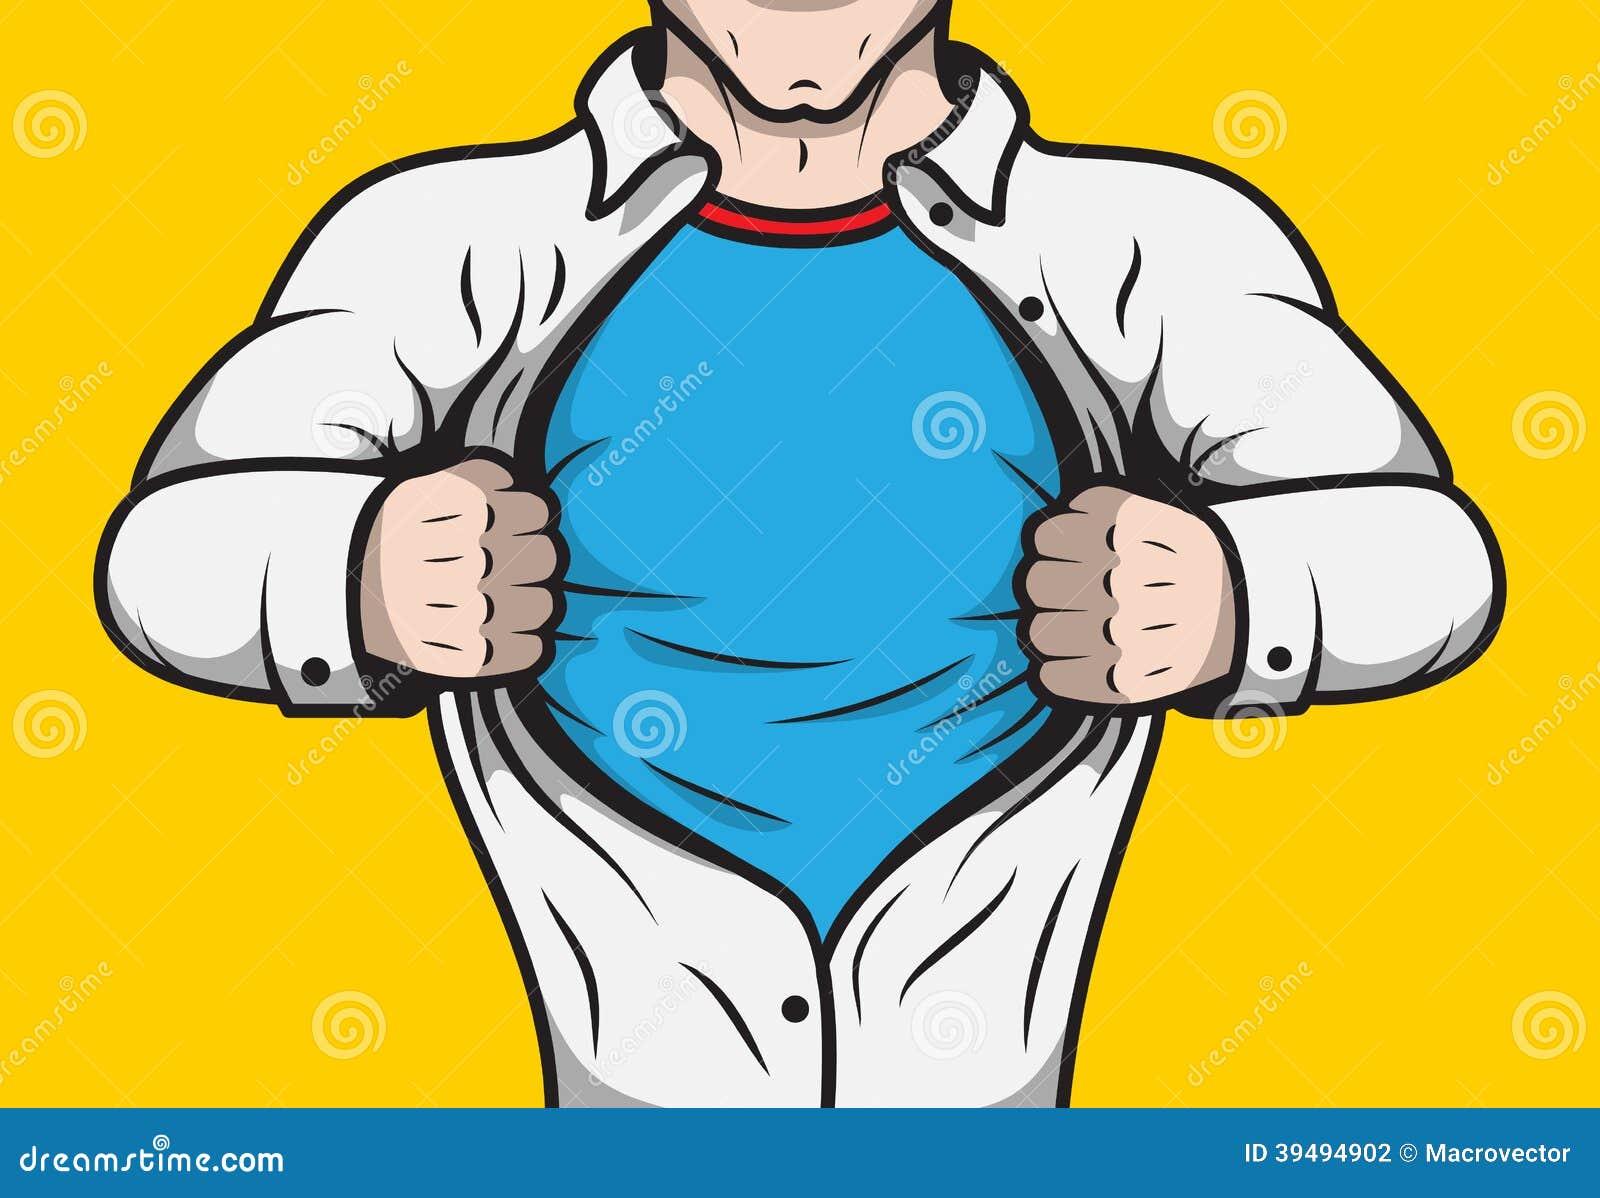 disguised comic book superhero illustration 39494902 megapixl